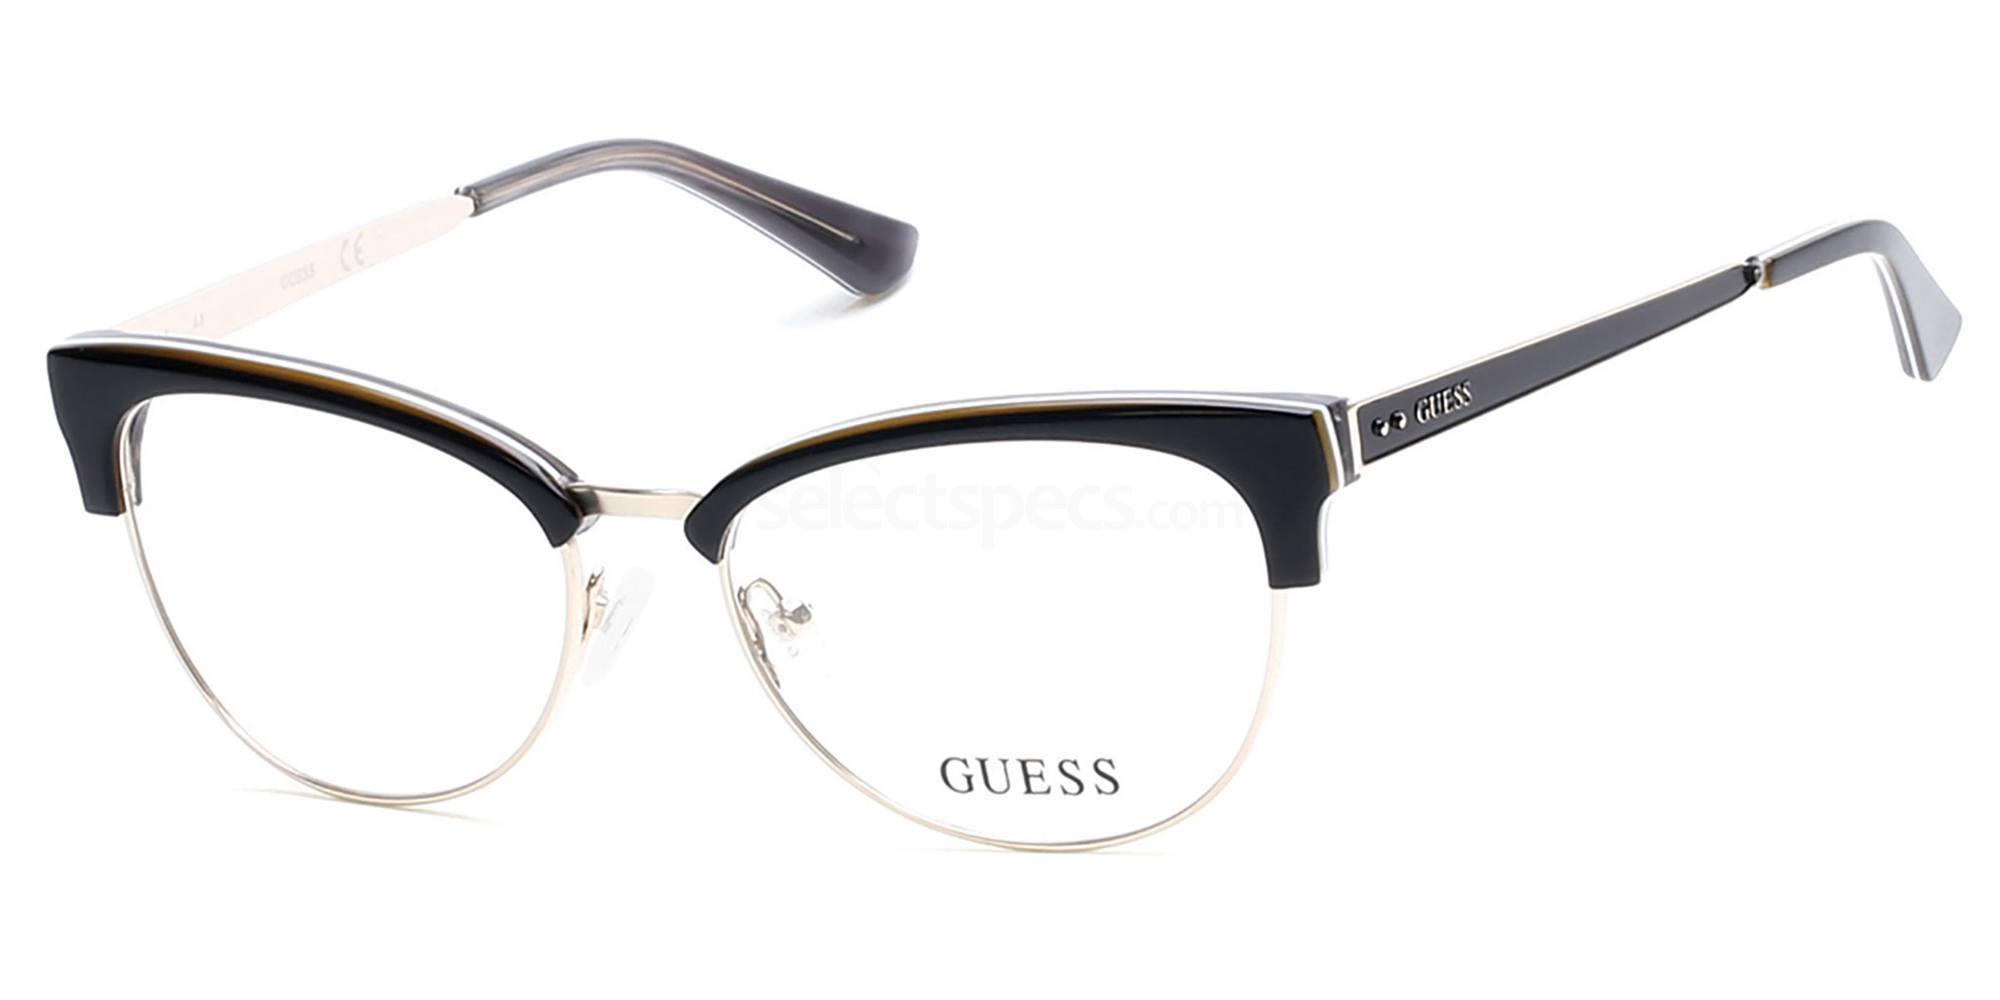 005 GU2552 Glasses, Guess